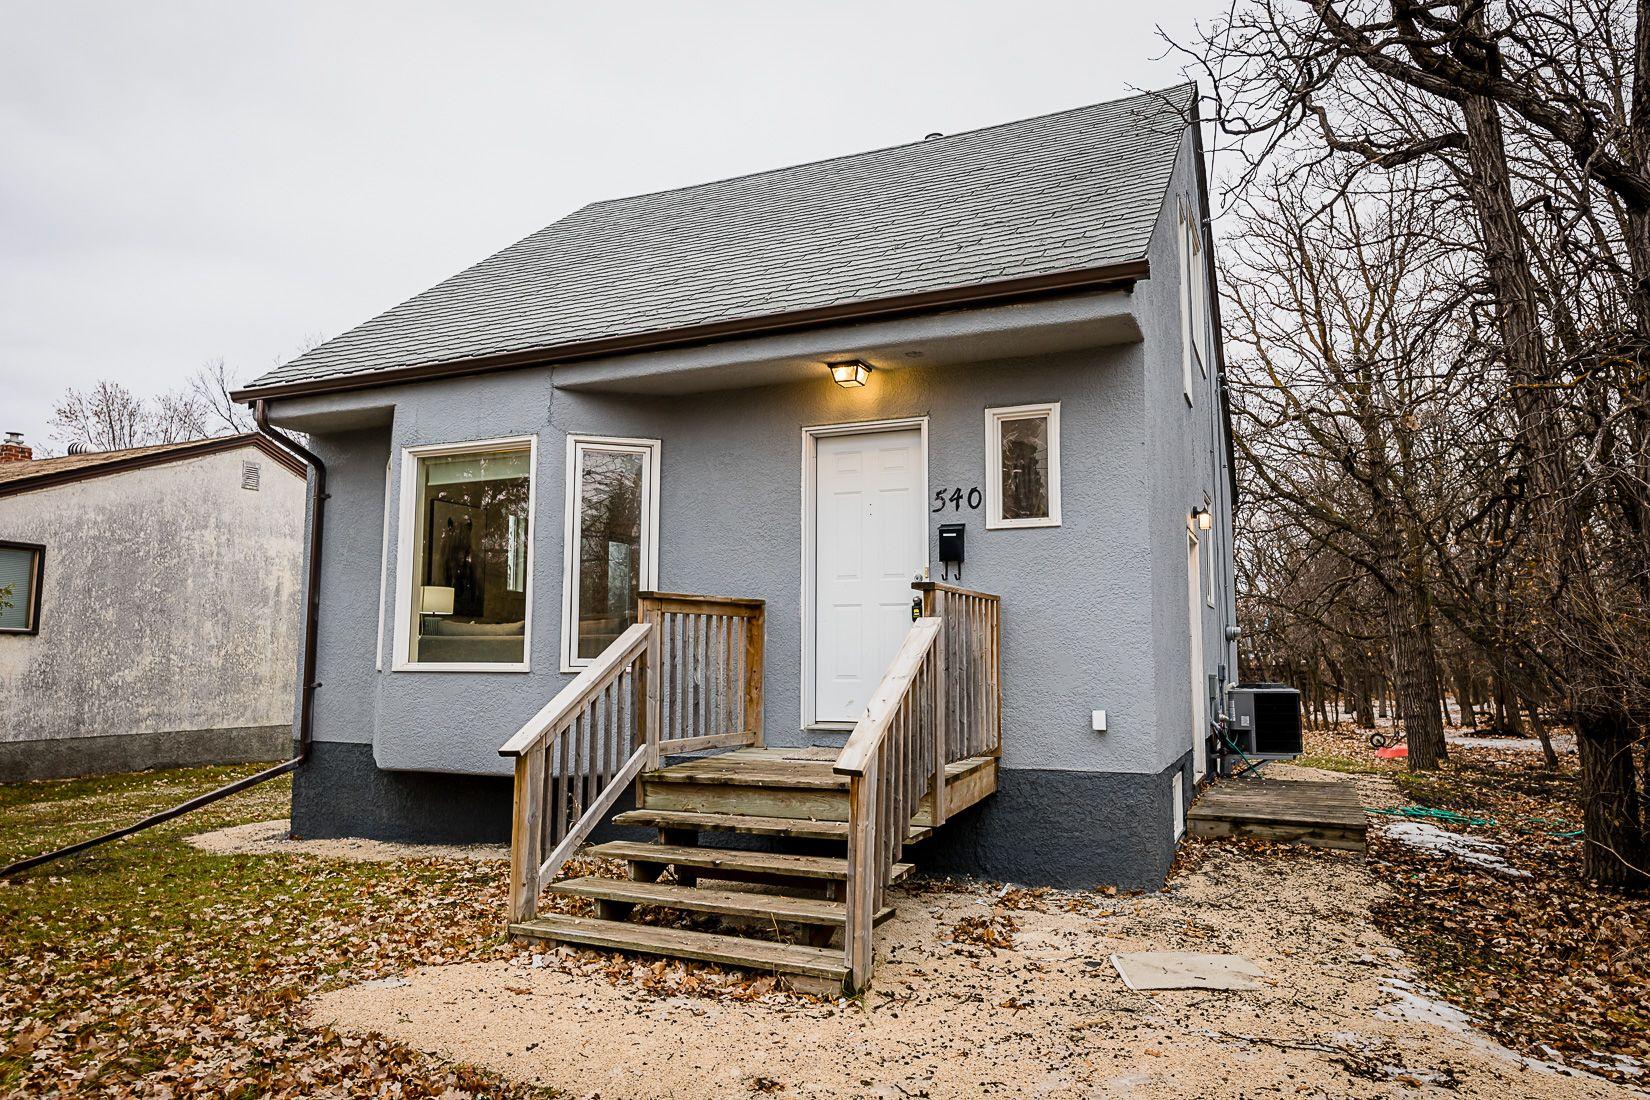 Main Photo: 540 Municipal Road in Winnipeg: Charleswood House for sale : MLS®# 1930976